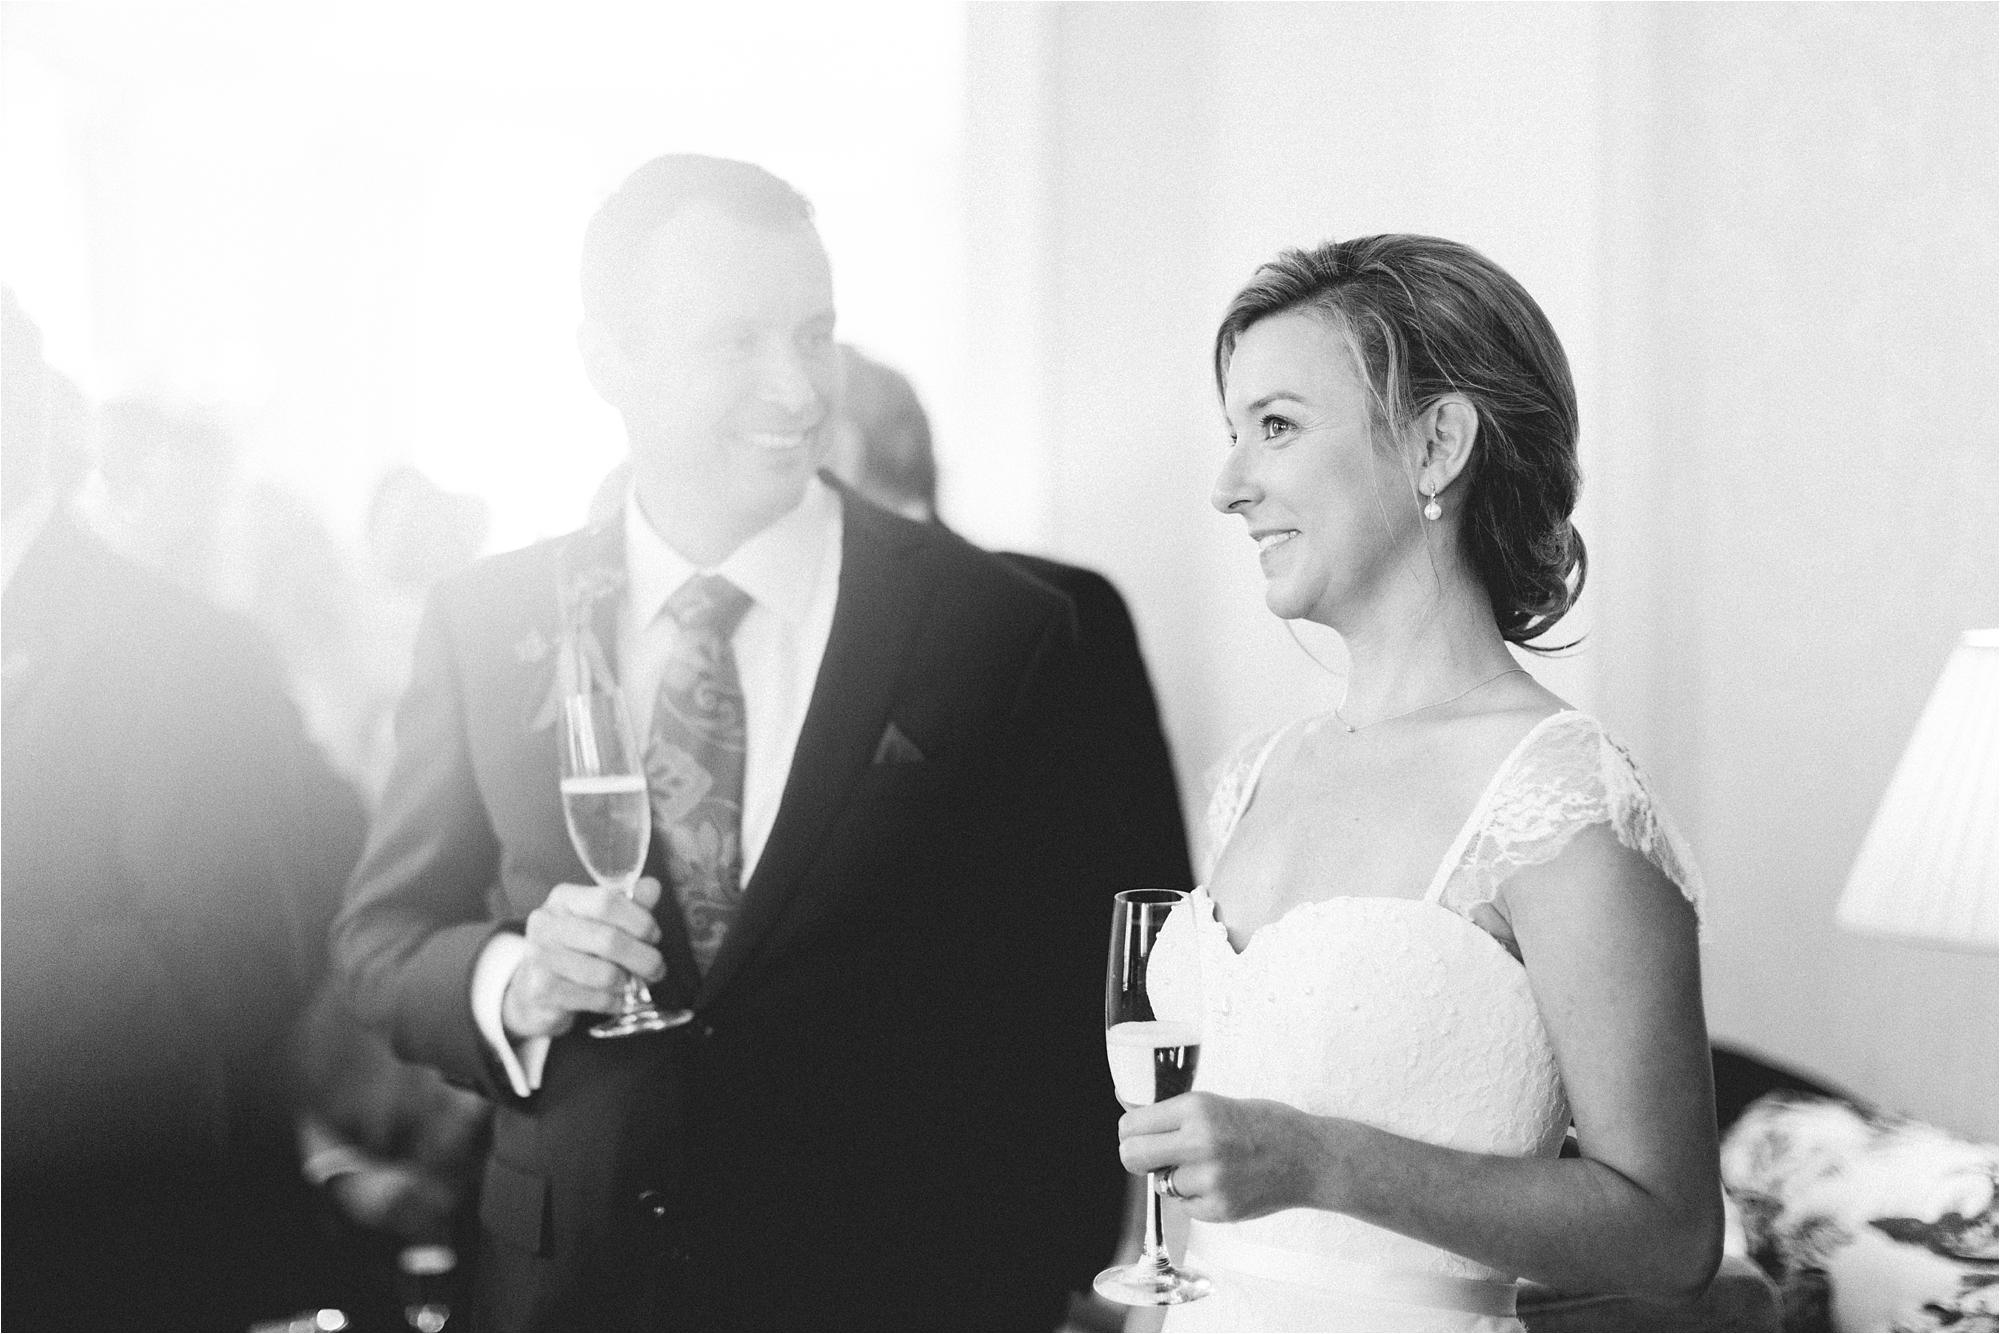 stephanie-yonce-photography-elegant-private-club-washington-dc-wedding-photos_0045.jpg